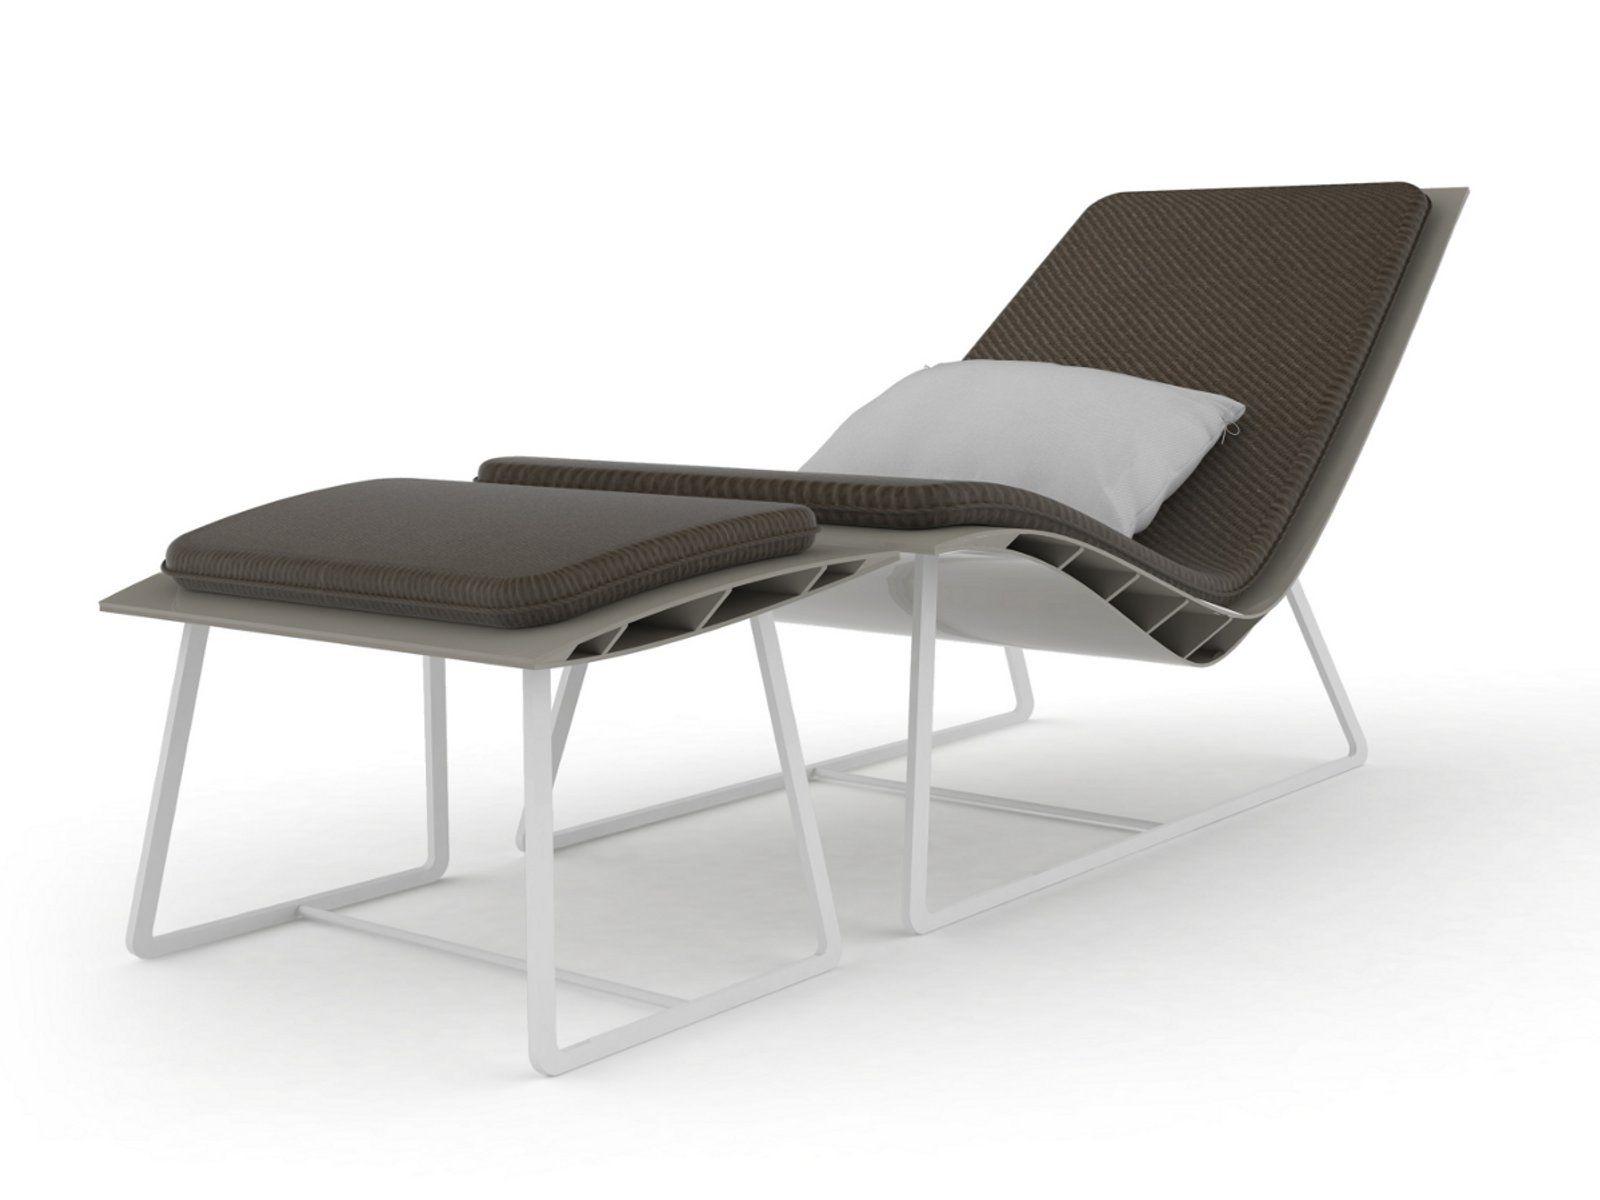 bee fauteuil avec repose pieds by la maison turrini design fritsch durisotti. Black Bedroom Furniture Sets. Home Design Ideas